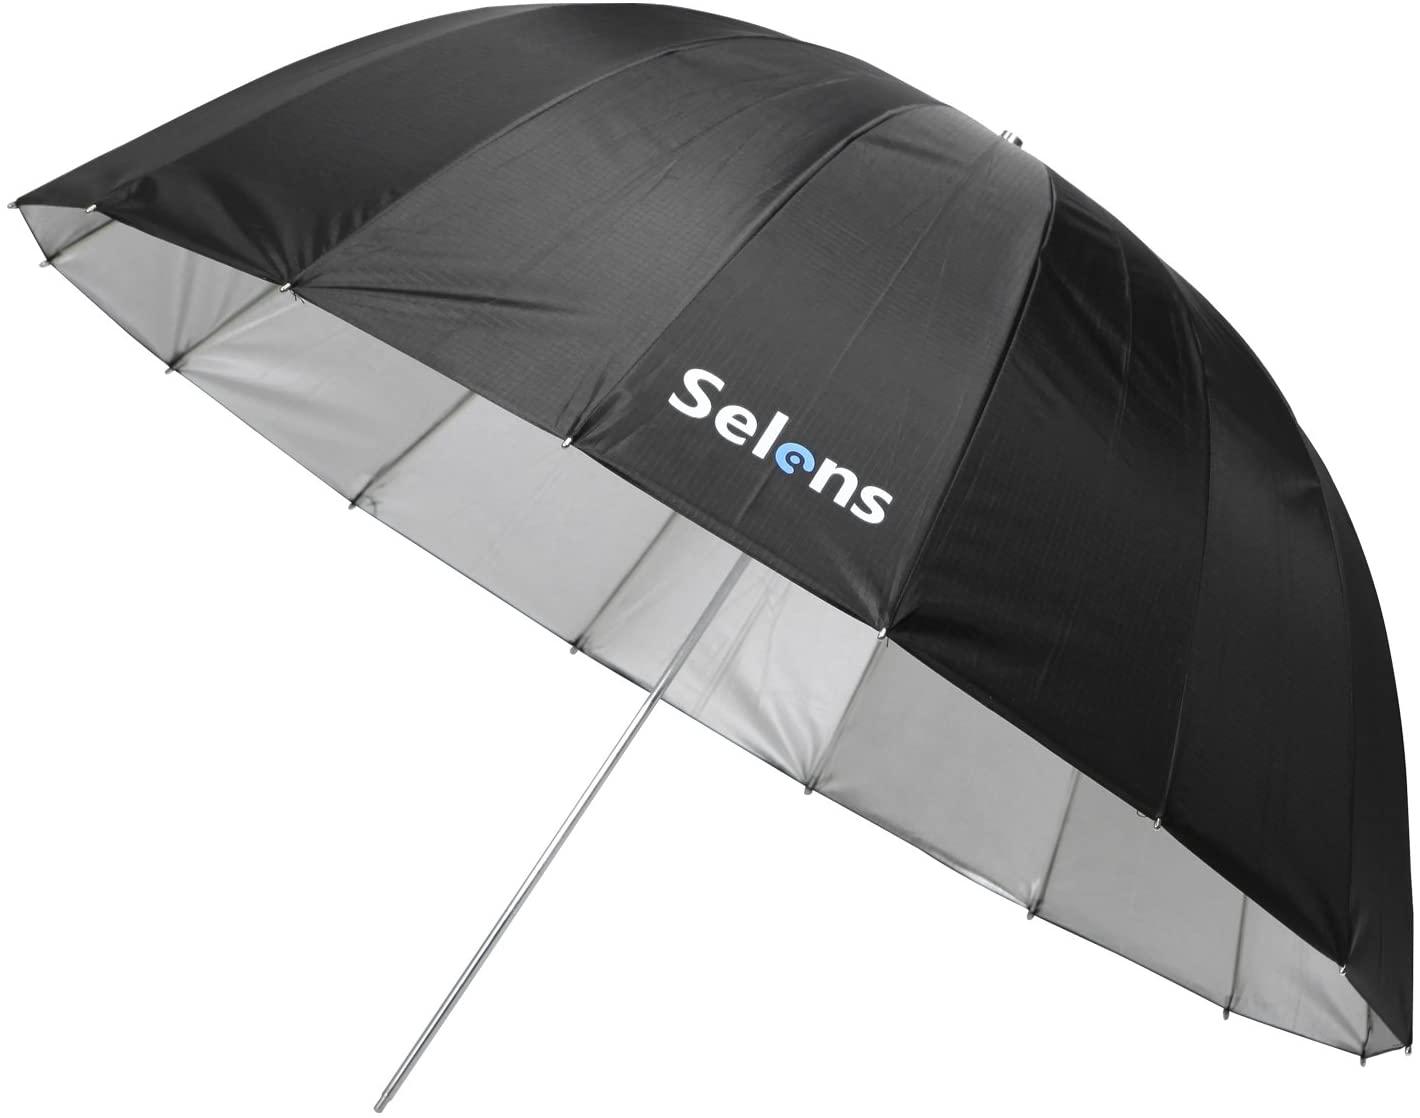 Selens 41 Inch 16 Rods Professional Photography Photo Studio Parabolic Reflective Lighting Umbrella, 15 Inch Depth Black/Silver